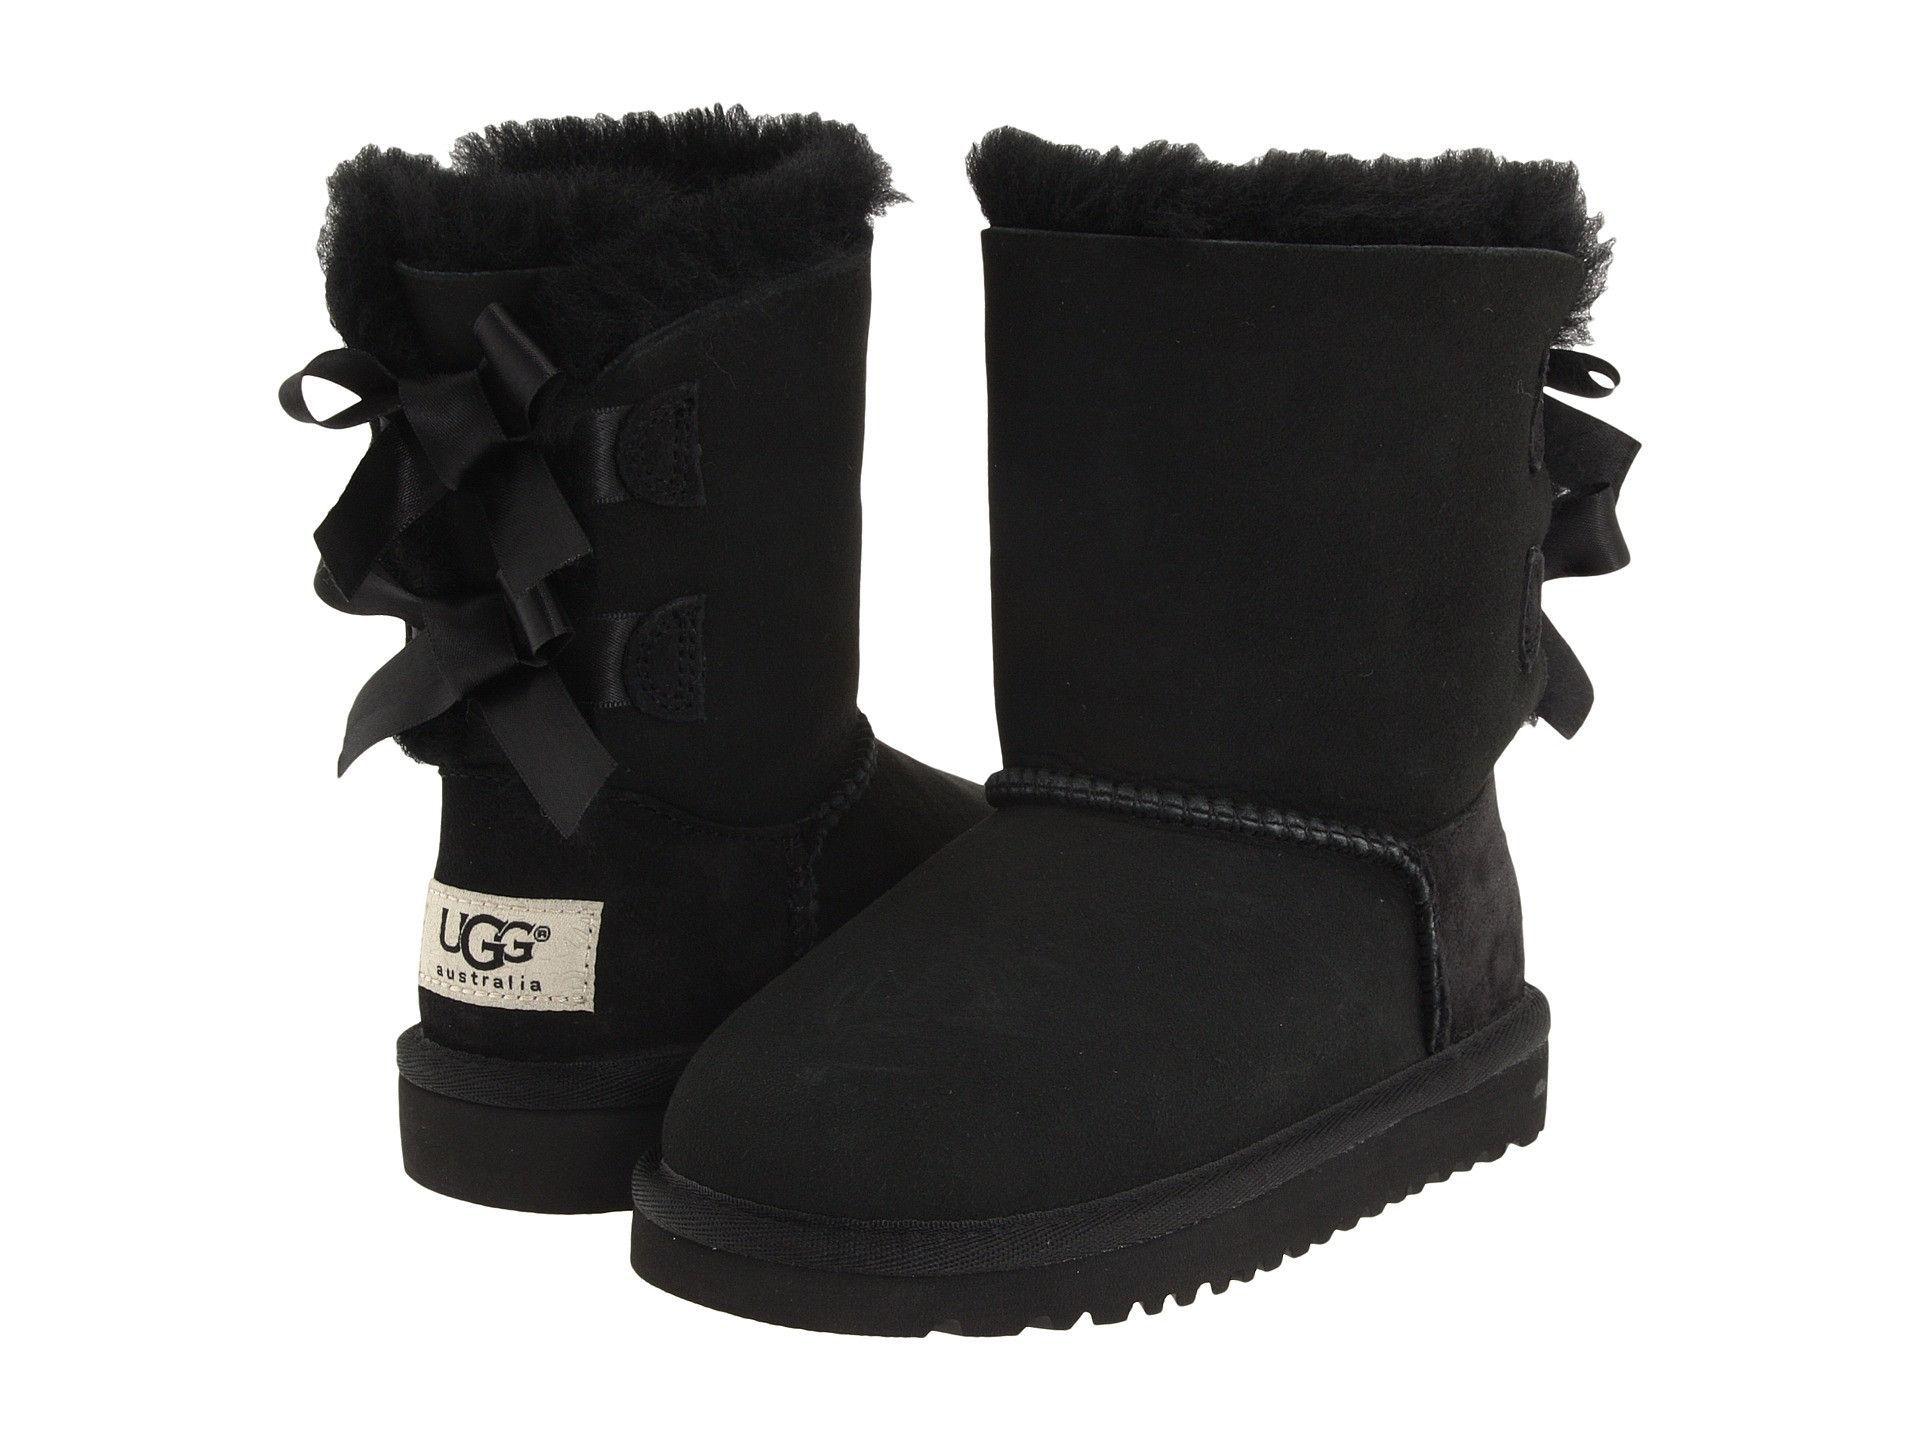 Ugg Australia Bailey Bow Boot - Black (Girls)